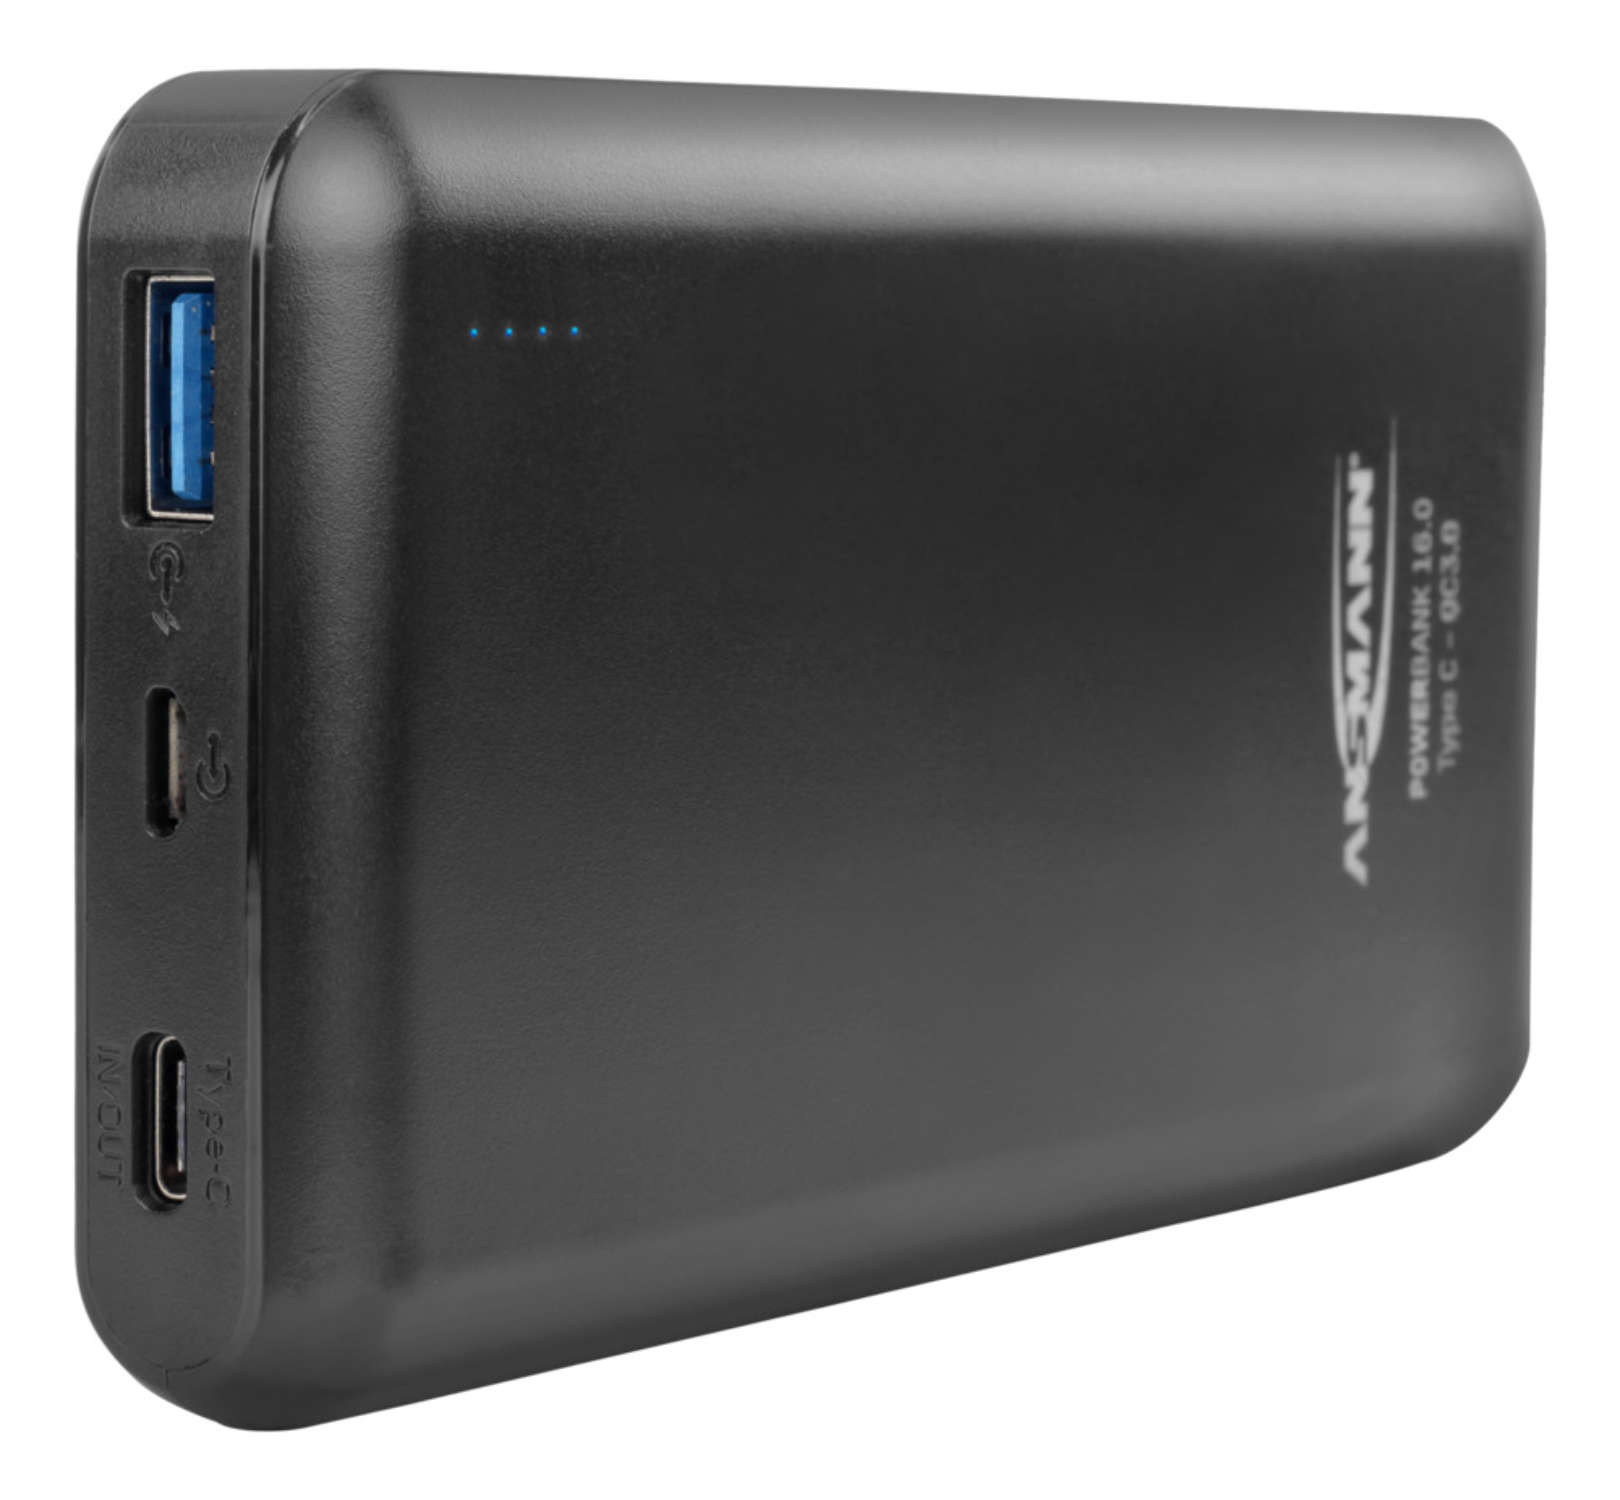 Powerbank 15.8 Type C - QC3.0